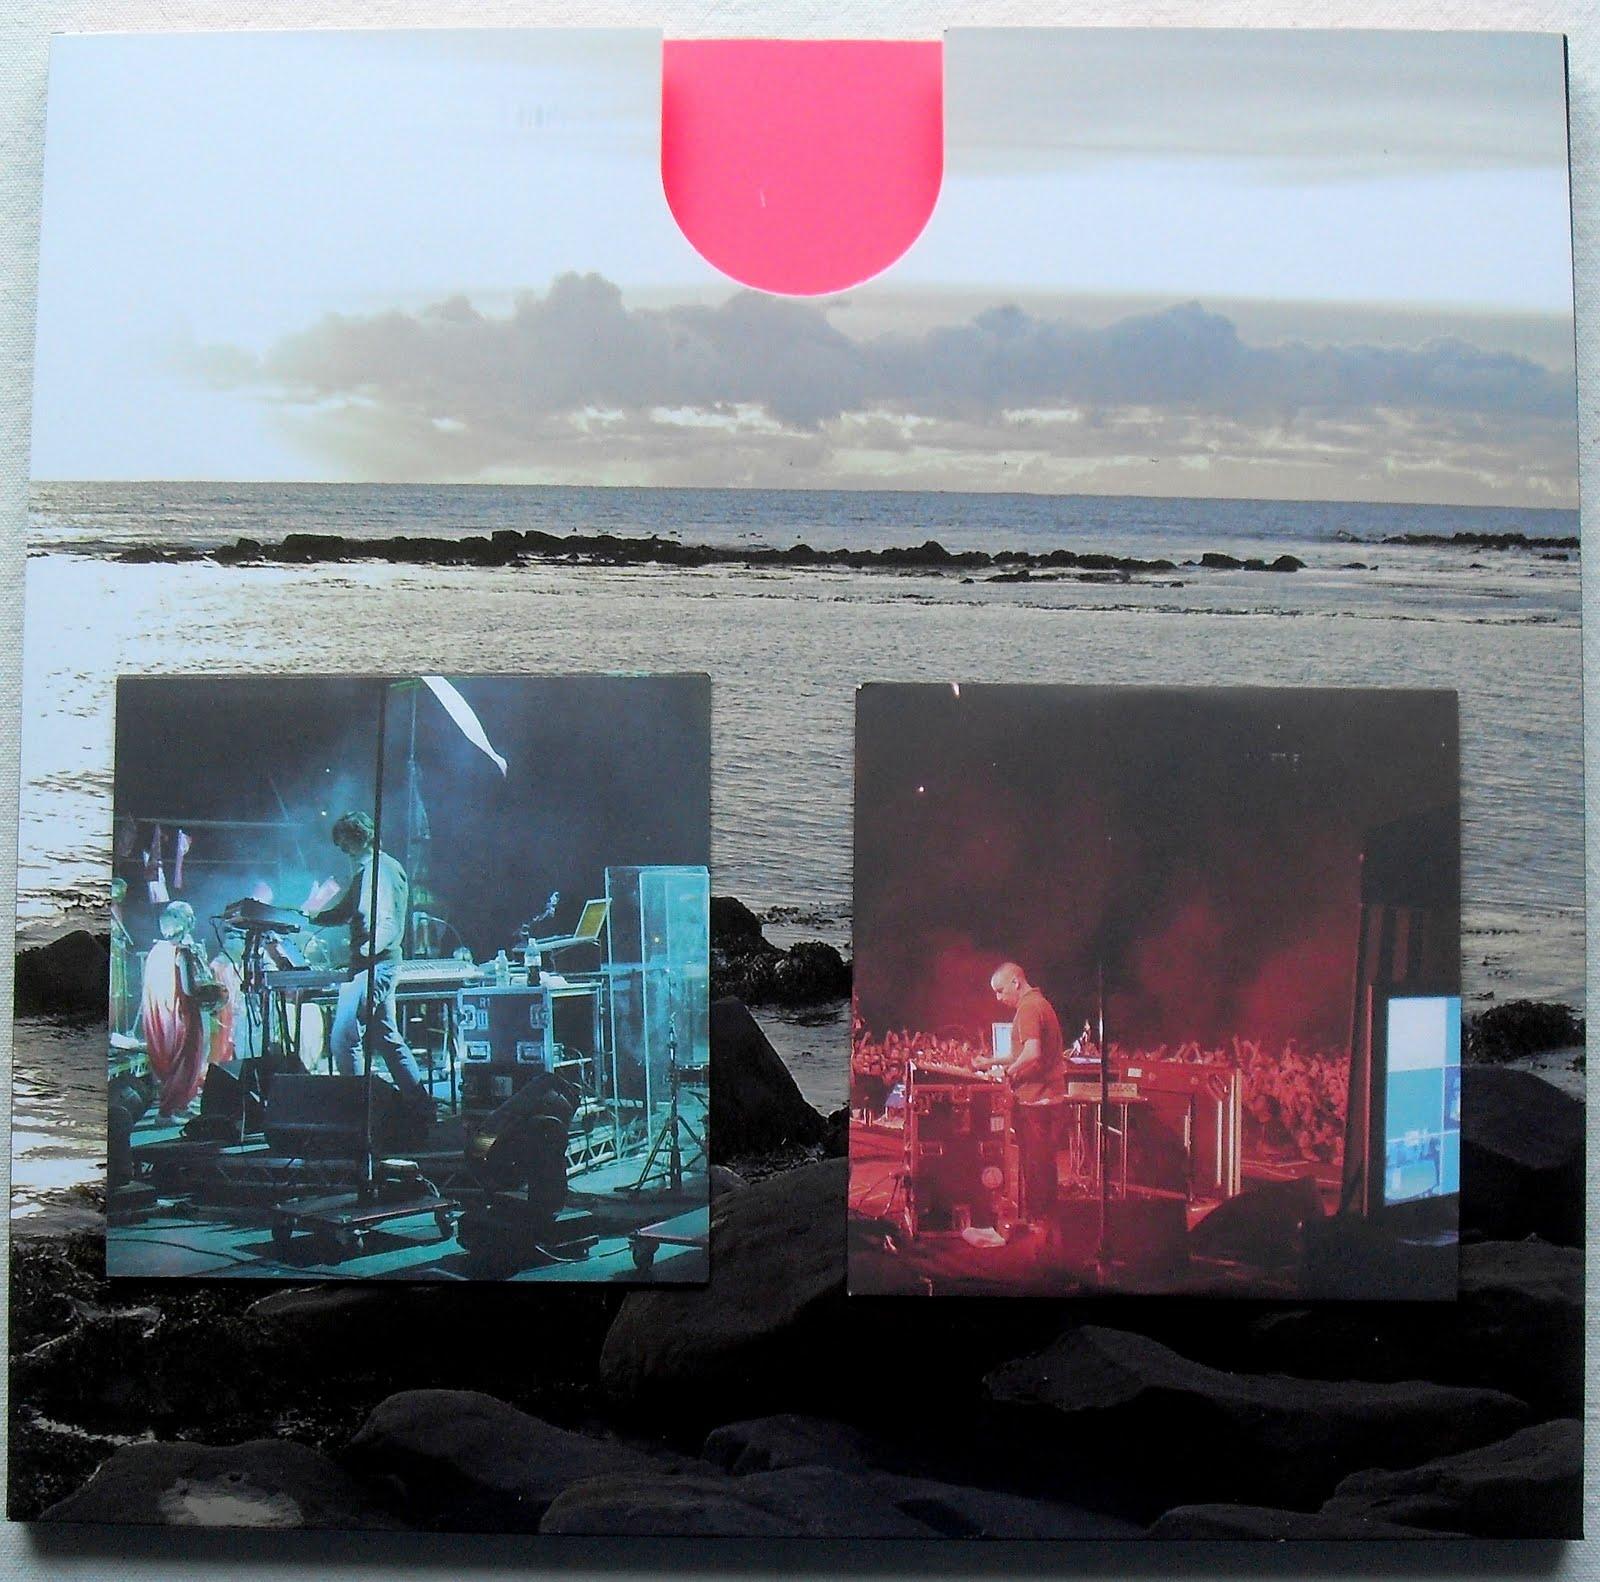 http://2.bp.blogspot.com/-qA4aHEcYI4Q/TgNX06VAu2I/AAAAAAAAEjY/GAbc98bRr4M/s1600/BJORK+Voltaic+2009+LImited+Edition+Double+Vinyl+DVD+CD+Box+Set+LP+Record+Album+H.JPG